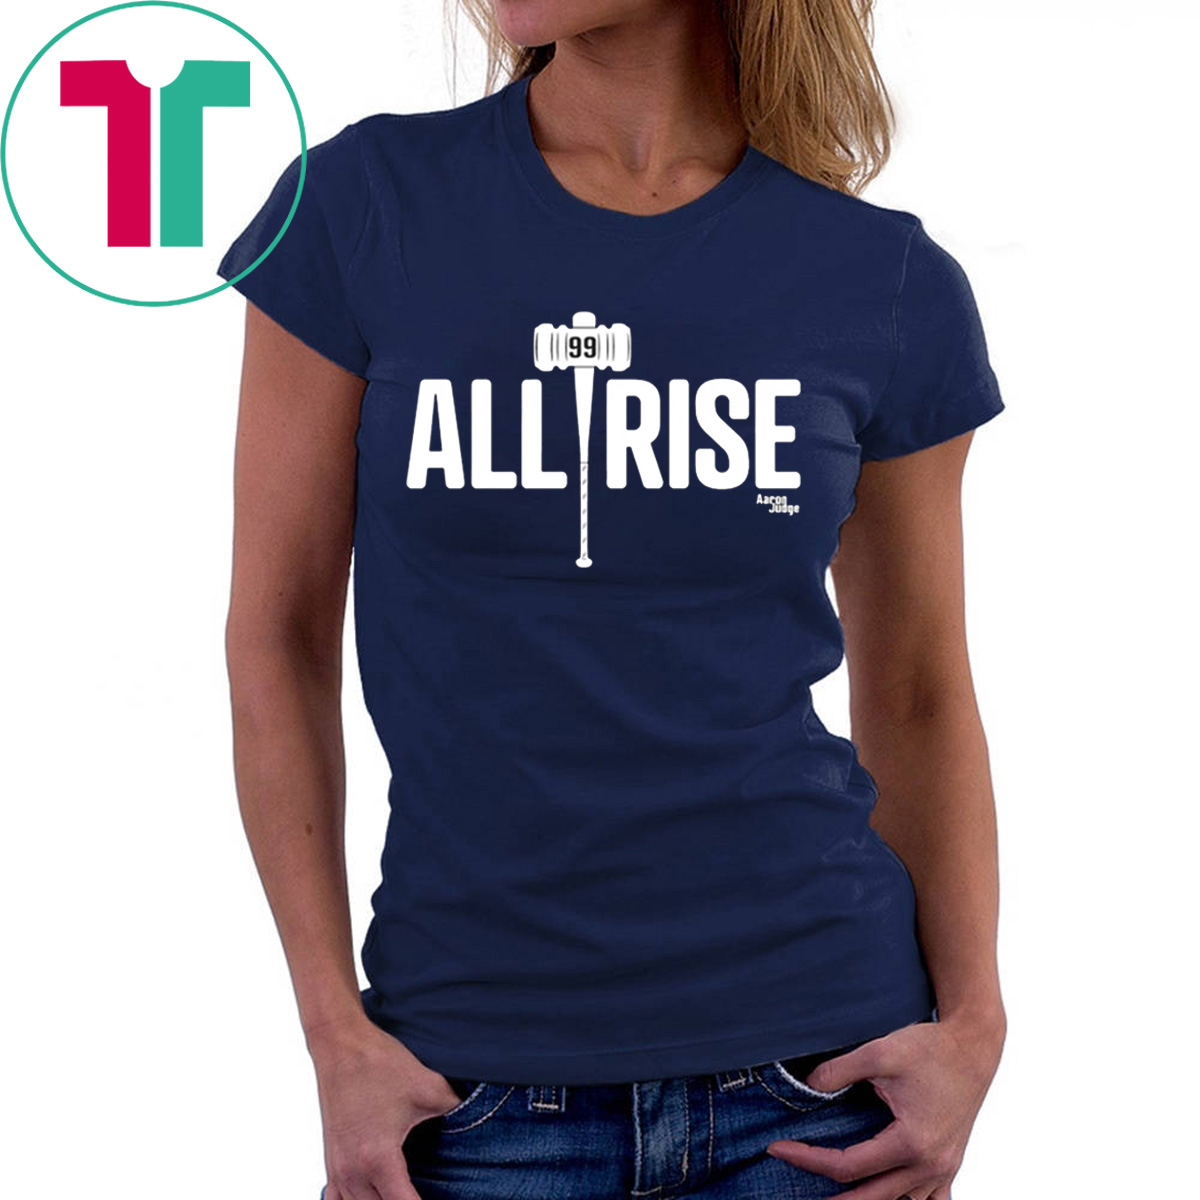 new concept 23b19 f2d8b All Rise Aaron Judge T-Shirt - Reviewshirts Office